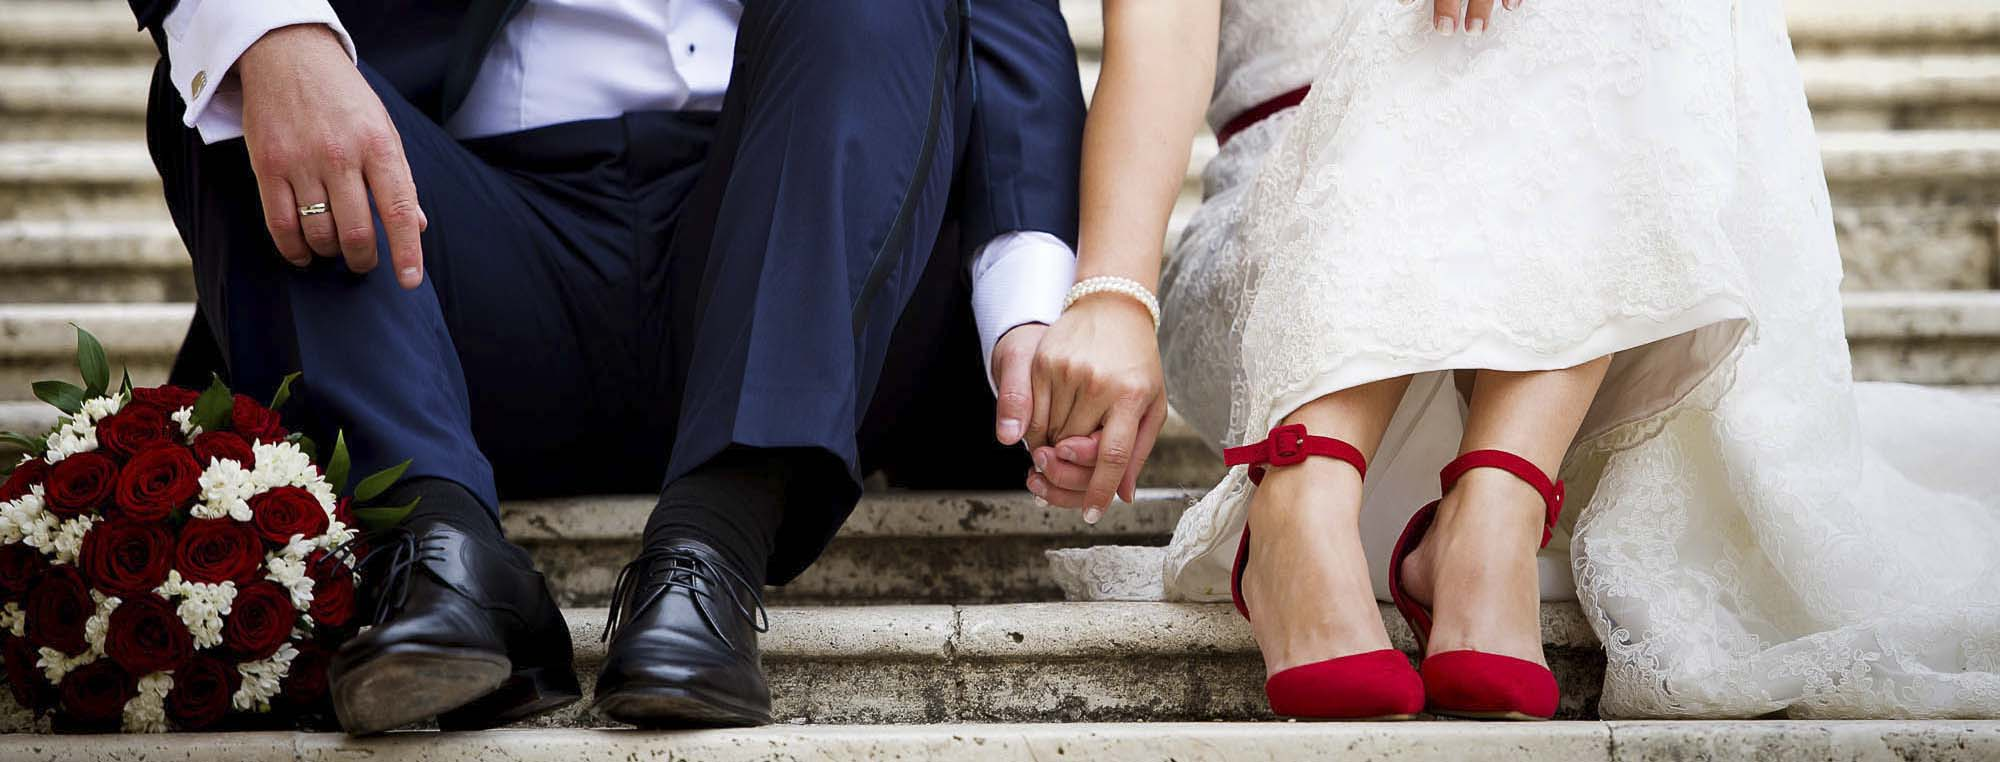 fotografo-matrimonio-video-matrimonio Gattinara